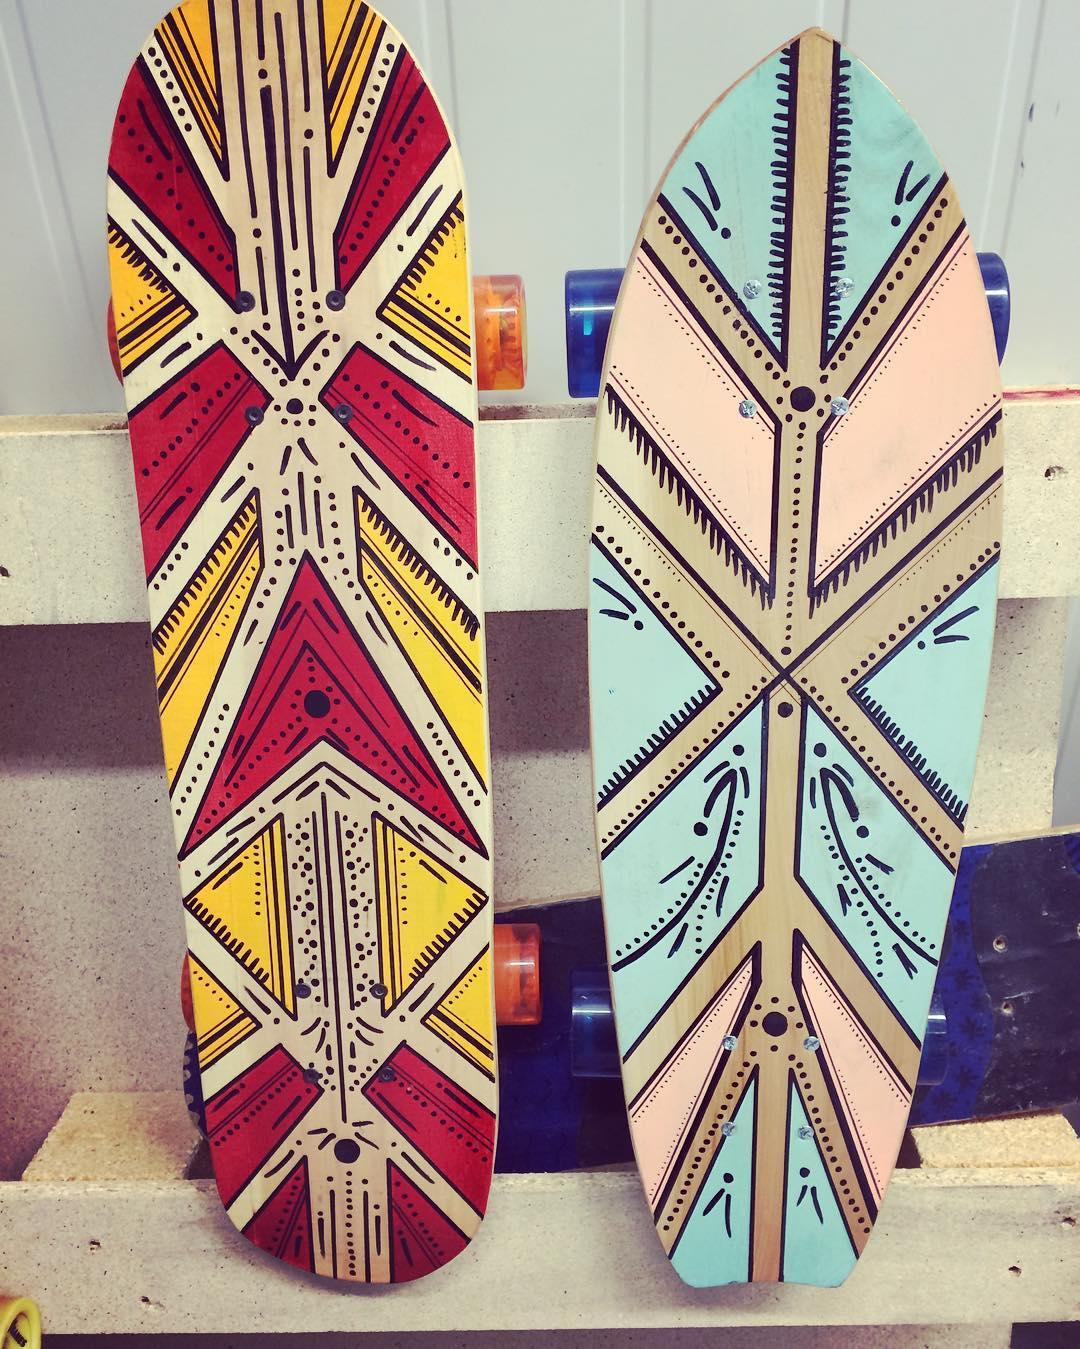 COMPRA tu #deslizate en www.deslizate.org // Buy your #deslizate in www.deslizate.org #skate #longboard #handmade #wood #design #art